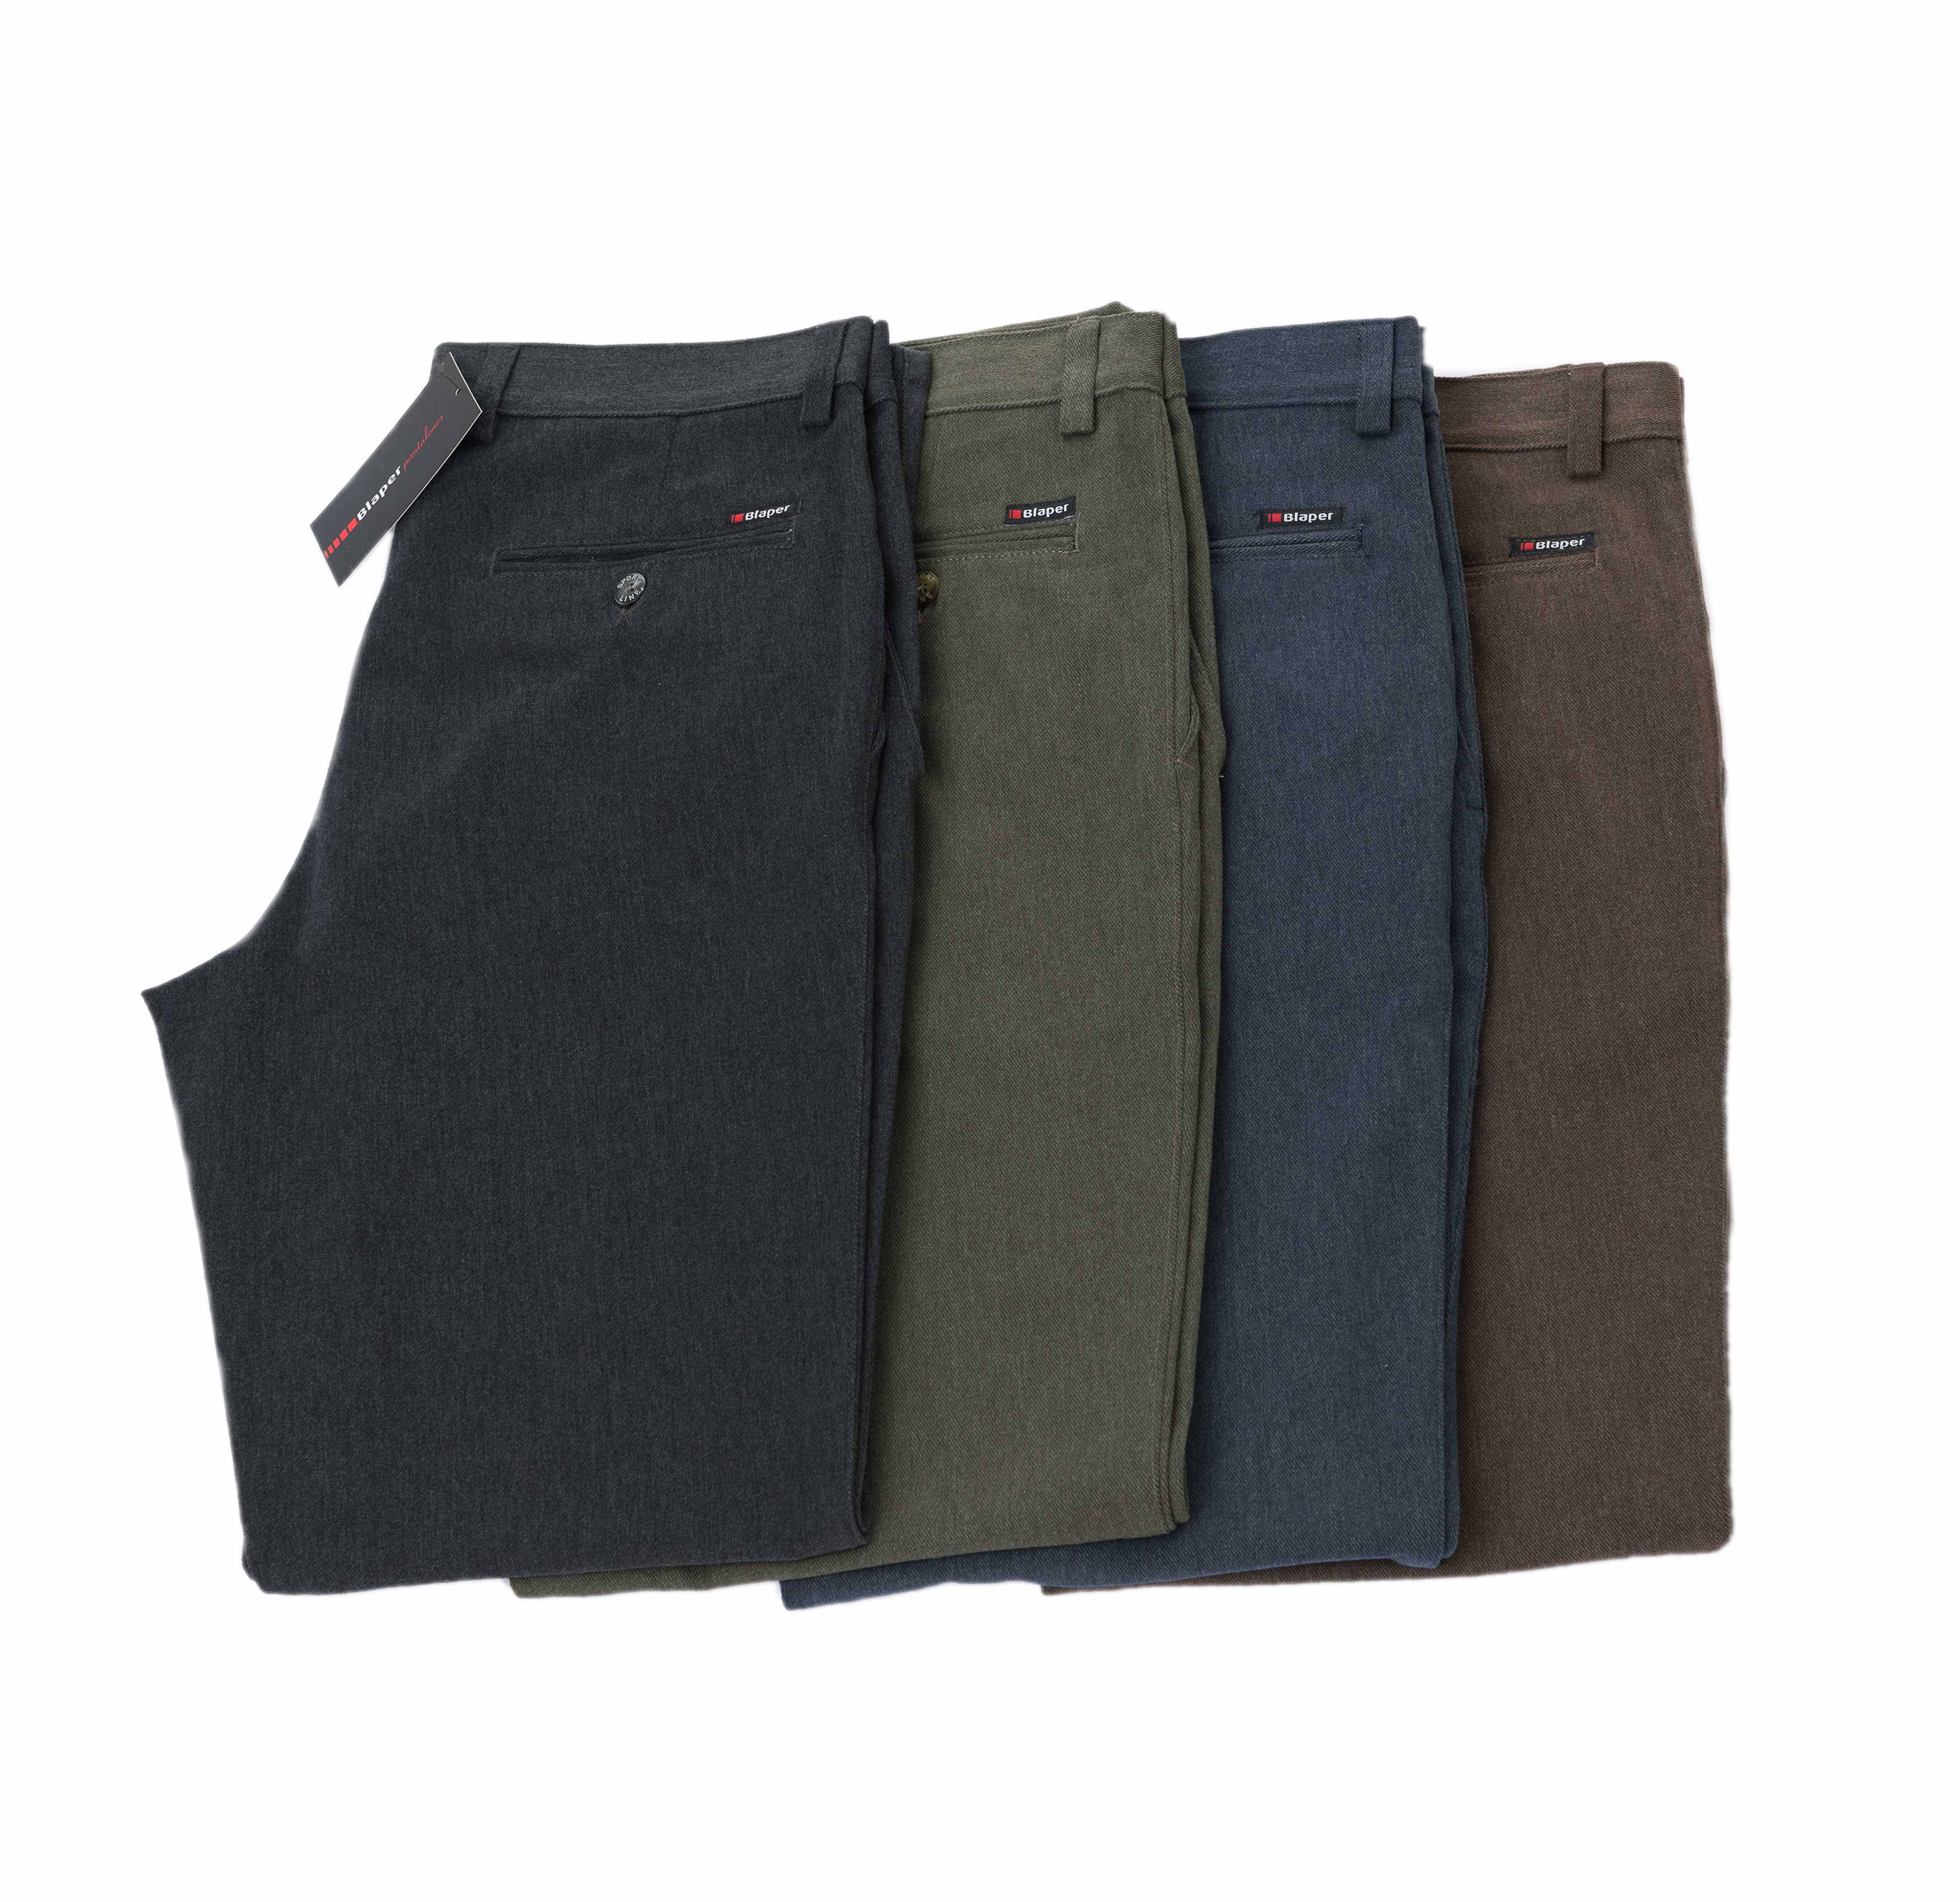 Pantalon Chino Para Hombre 2947 Pantalones Blaper